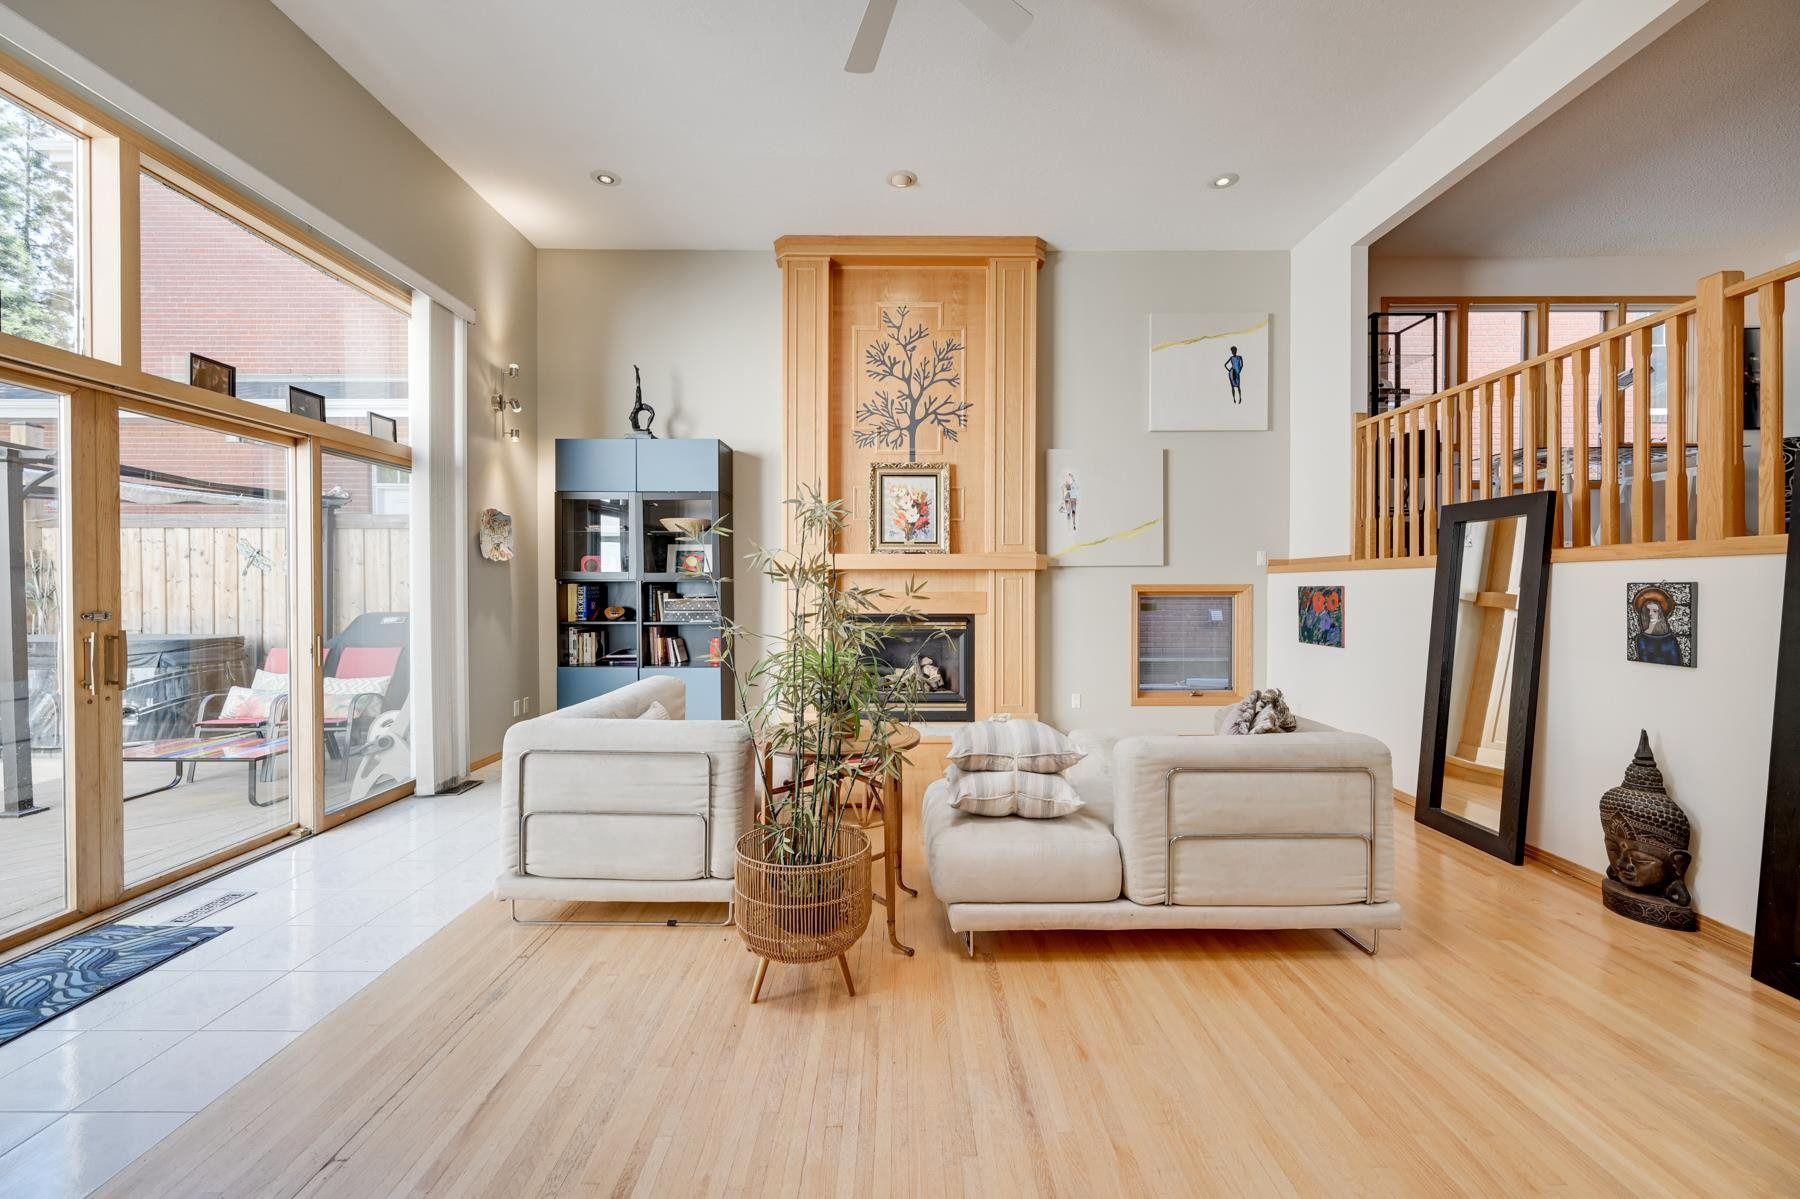 Main Photo: 13512 101 Avenue in Edmonton: Zone 11 House for sale : MLS®# E4263914